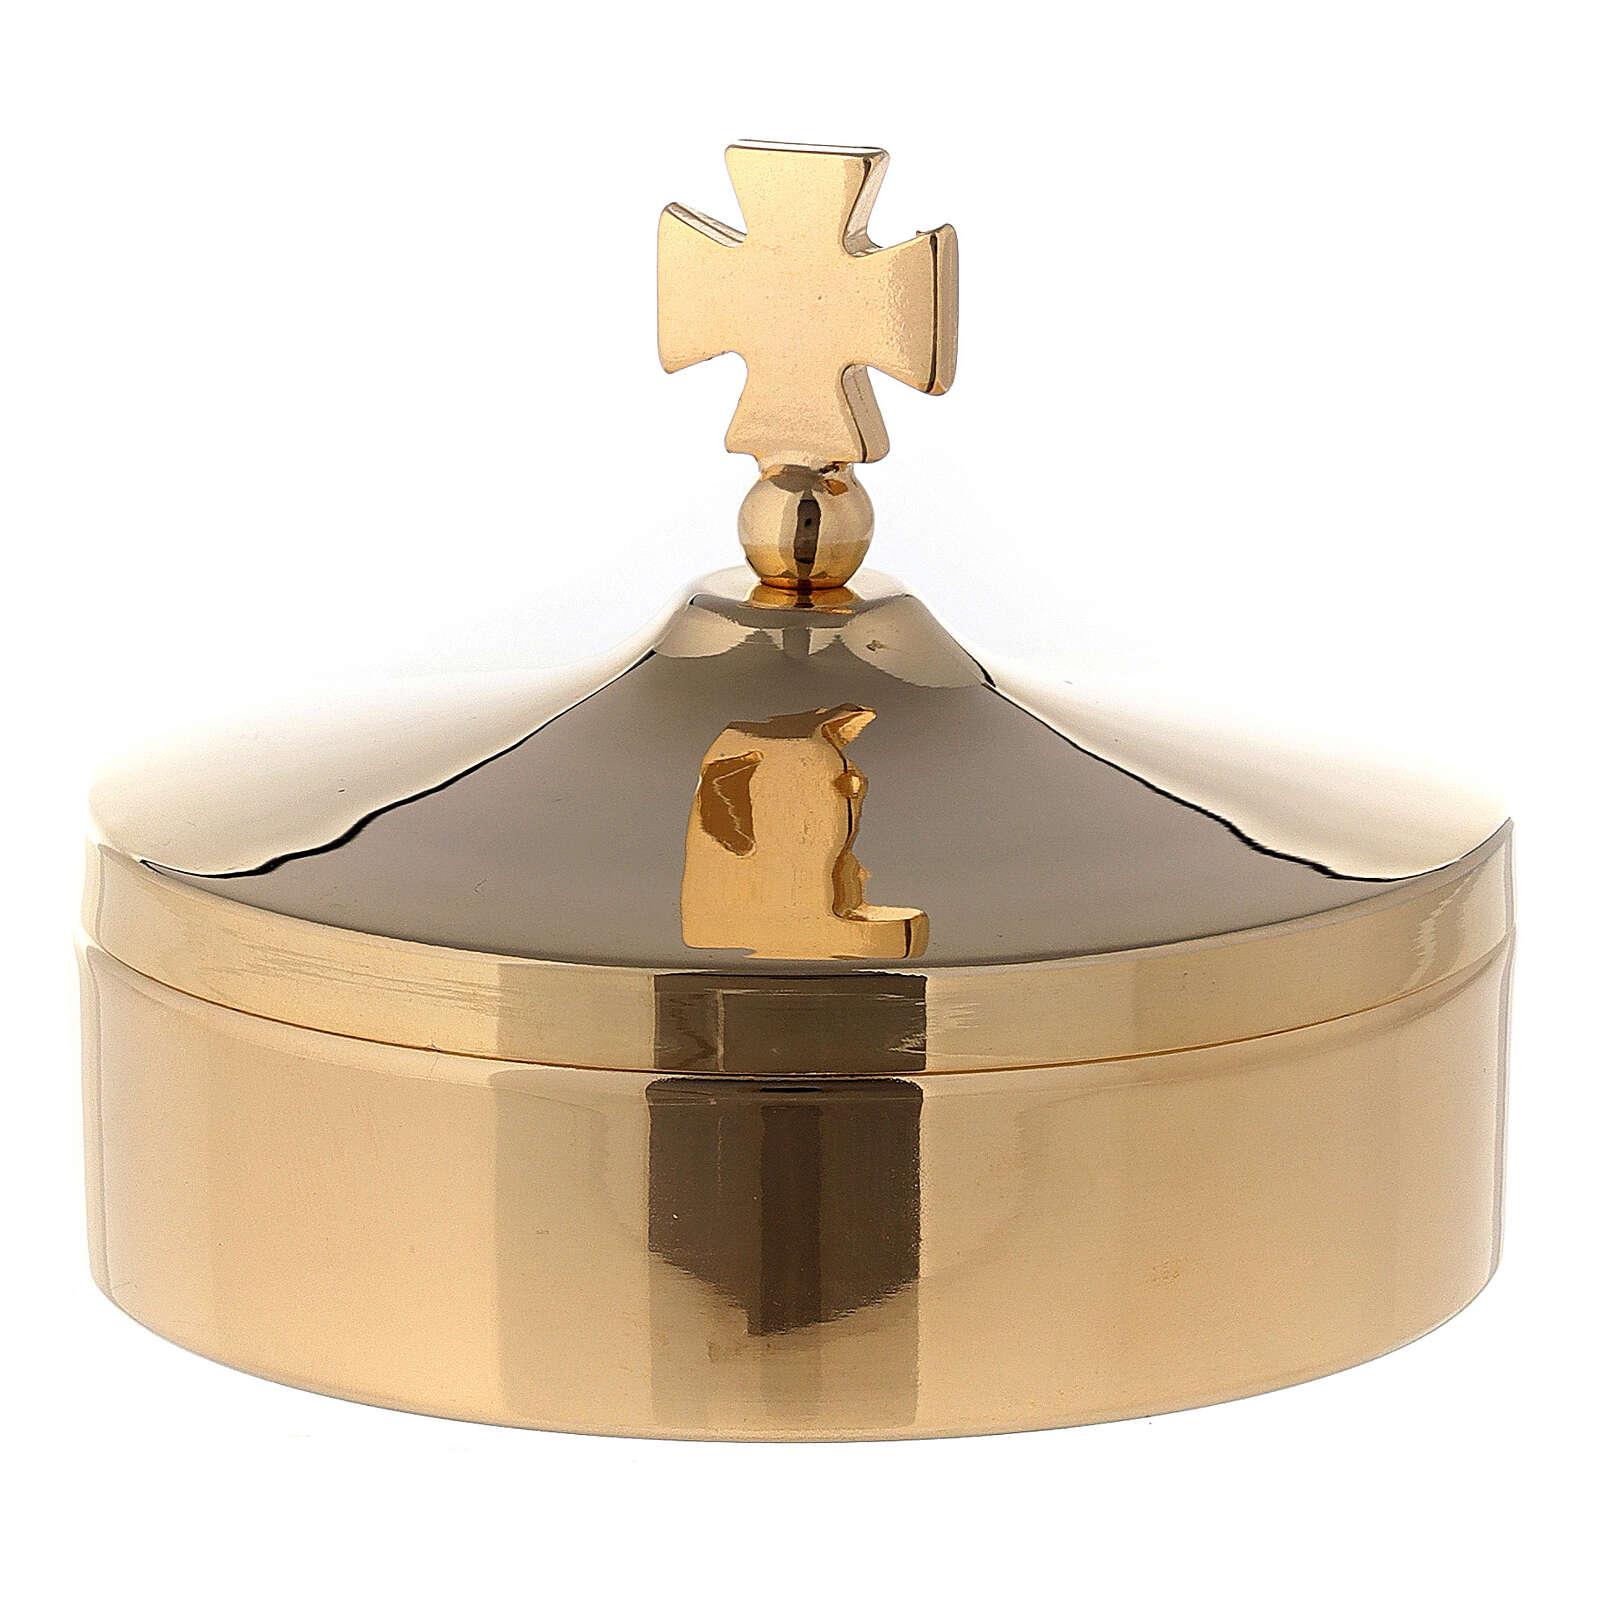 Wafer holder diameter 8 cm in 24K polished golden brass 3